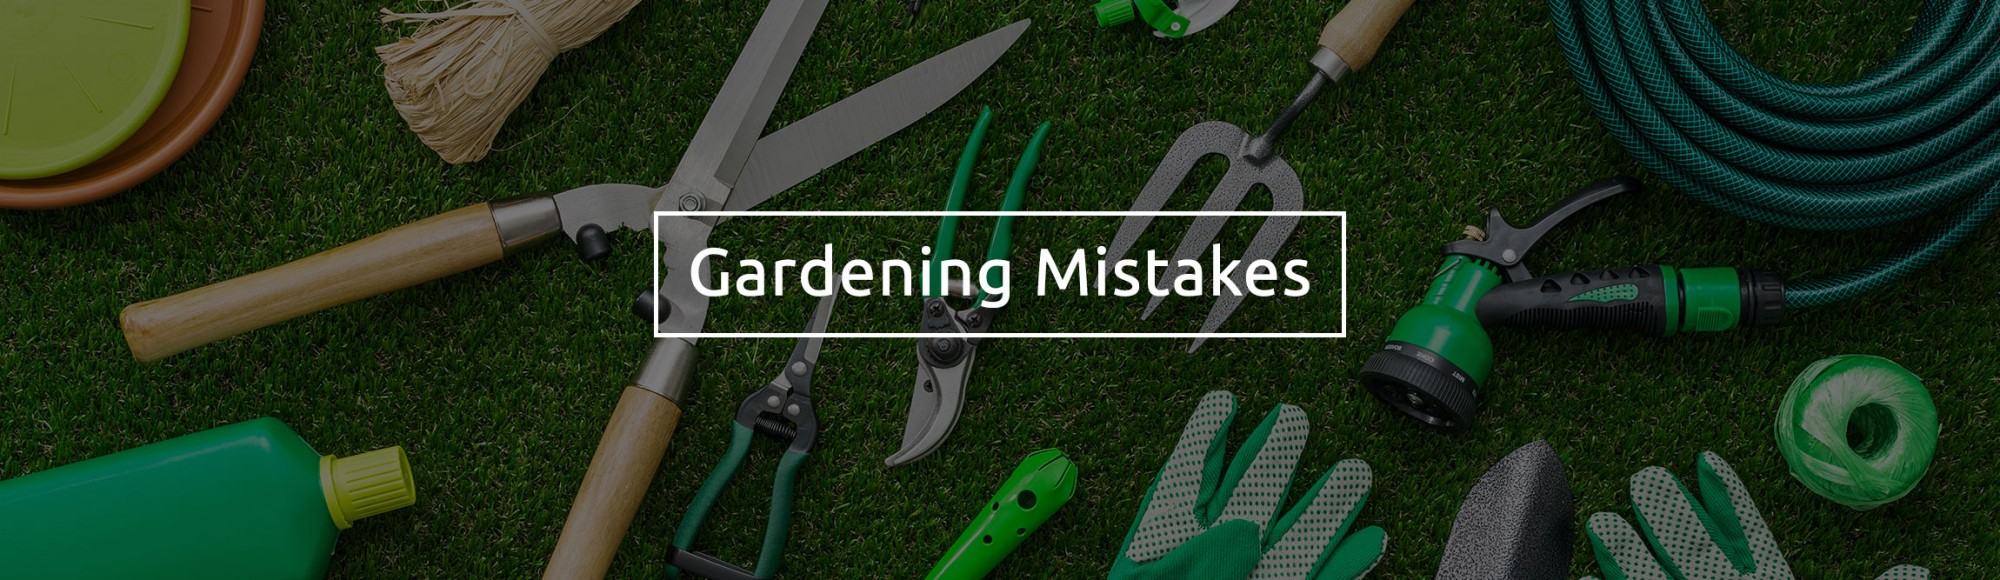 gardening-mistakes